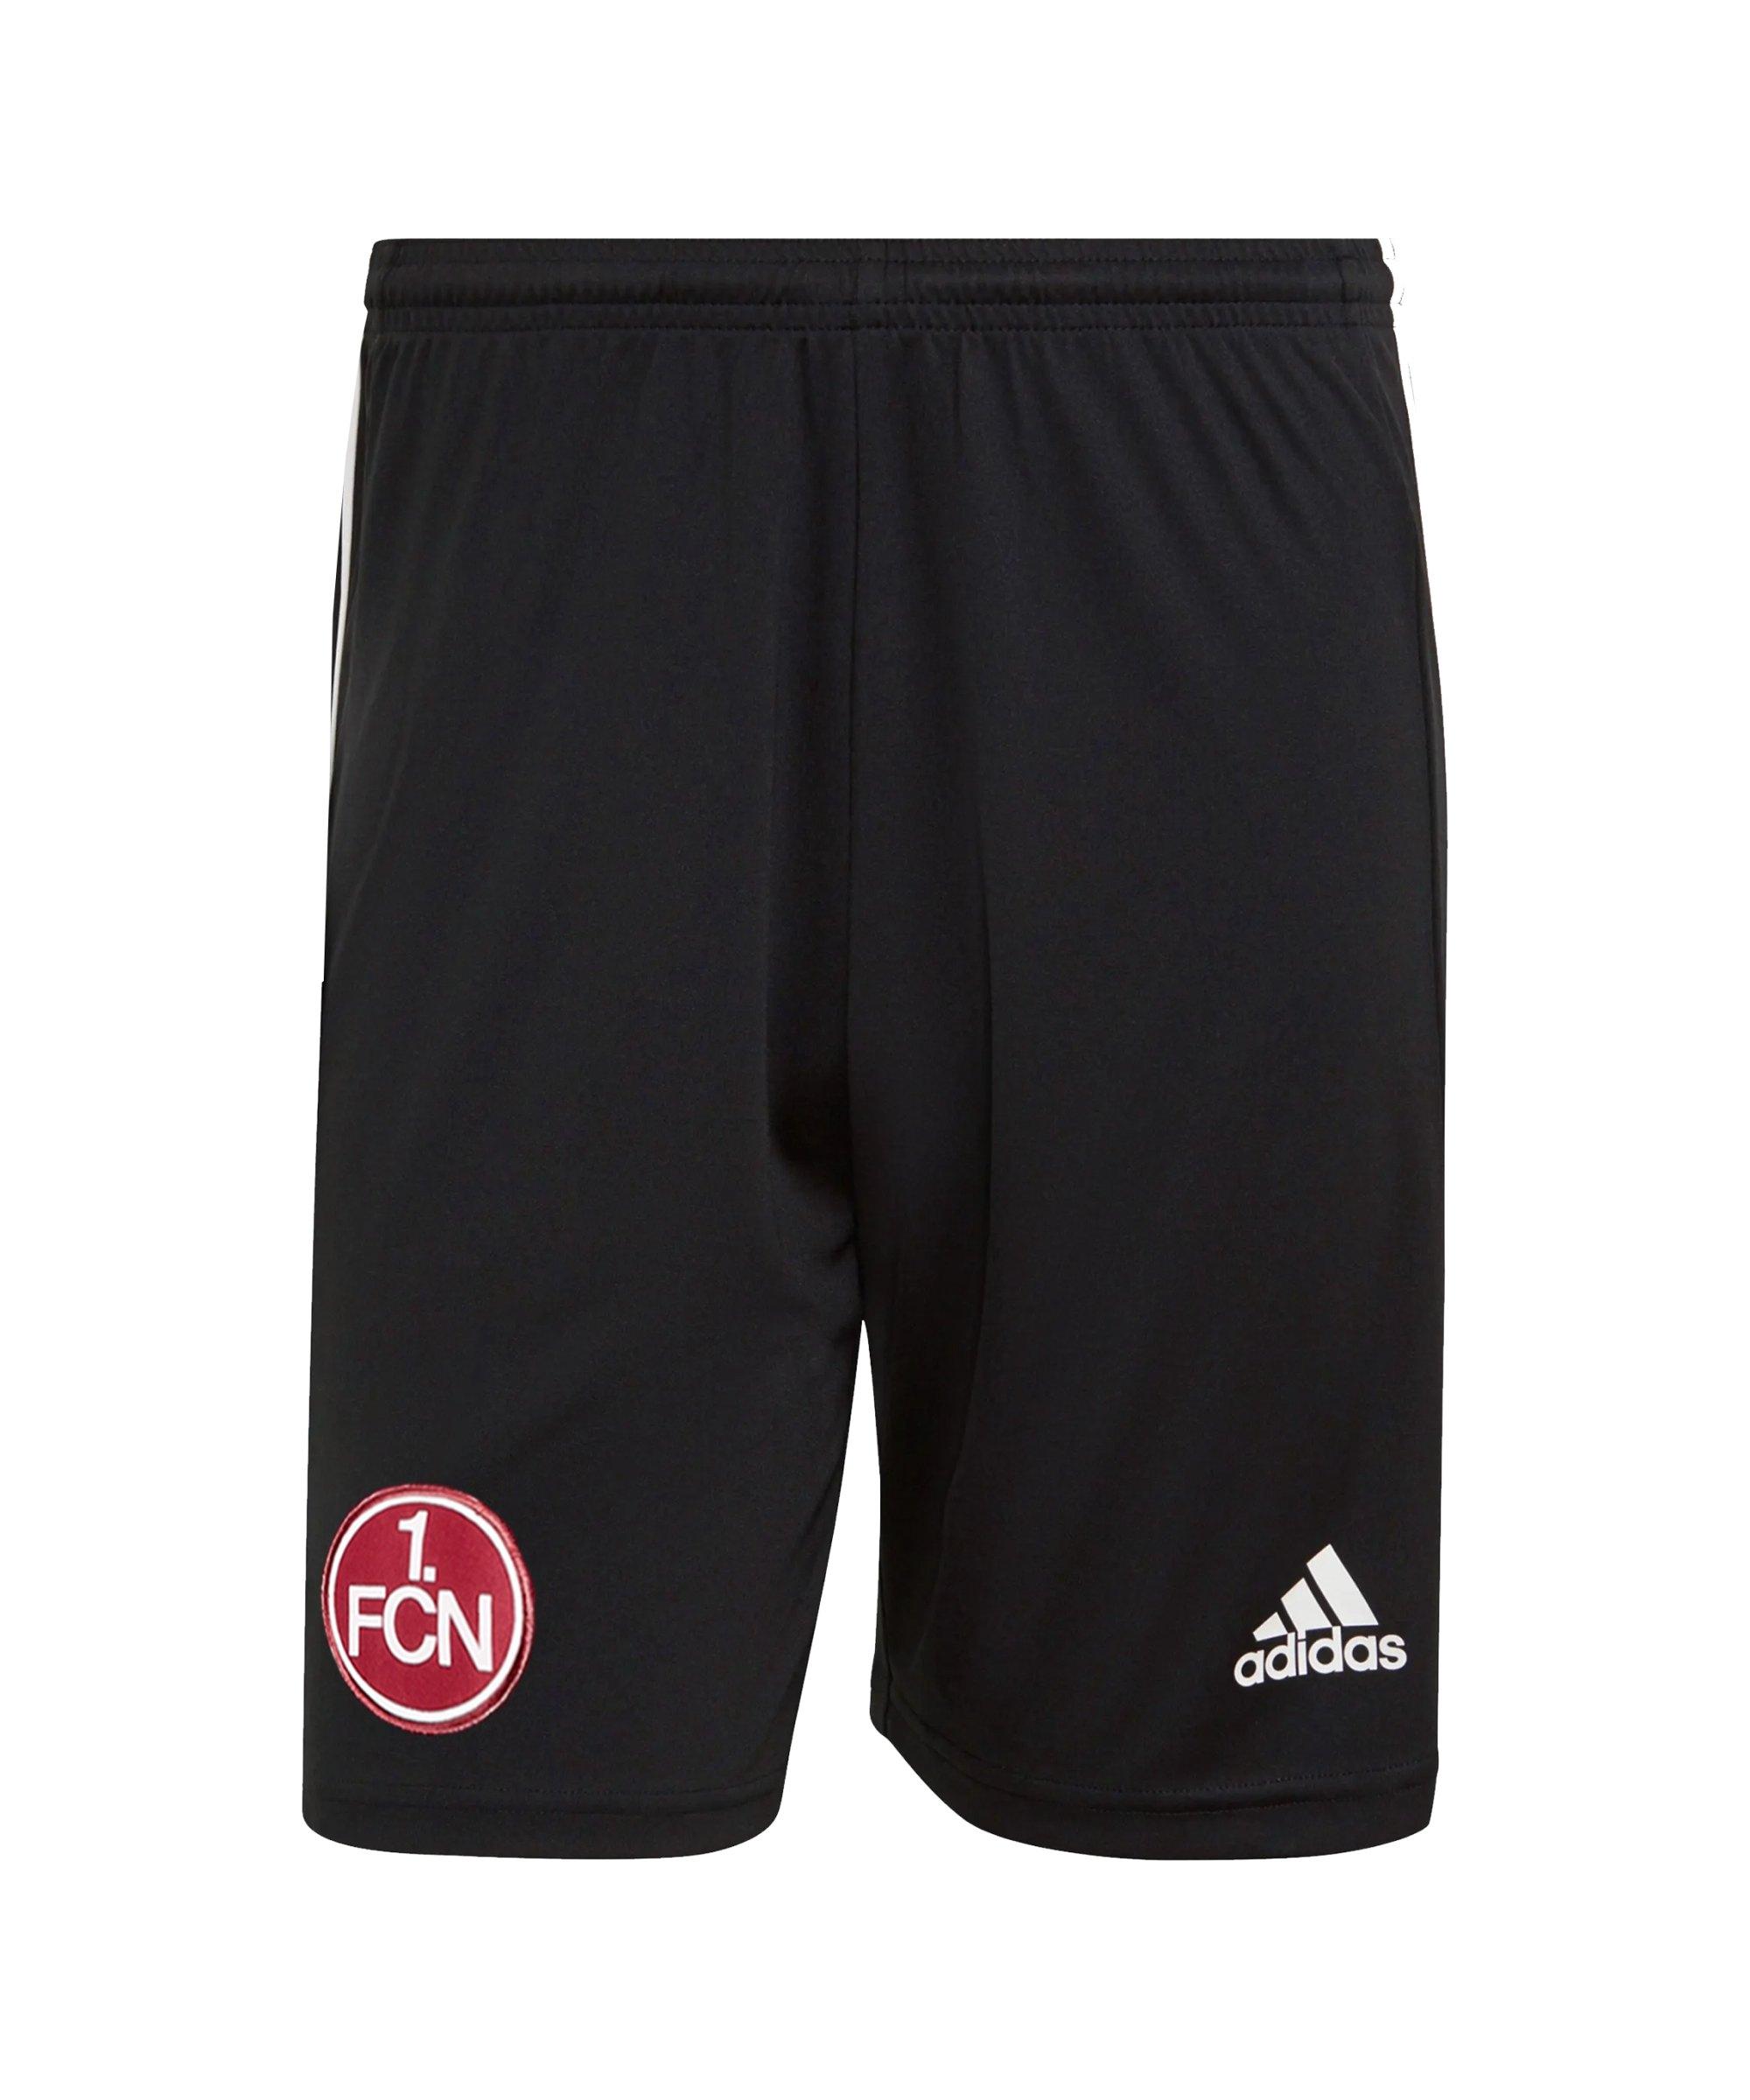 adidas 1. FC Nürnberg Trainingsshort Schwarz - schwarz